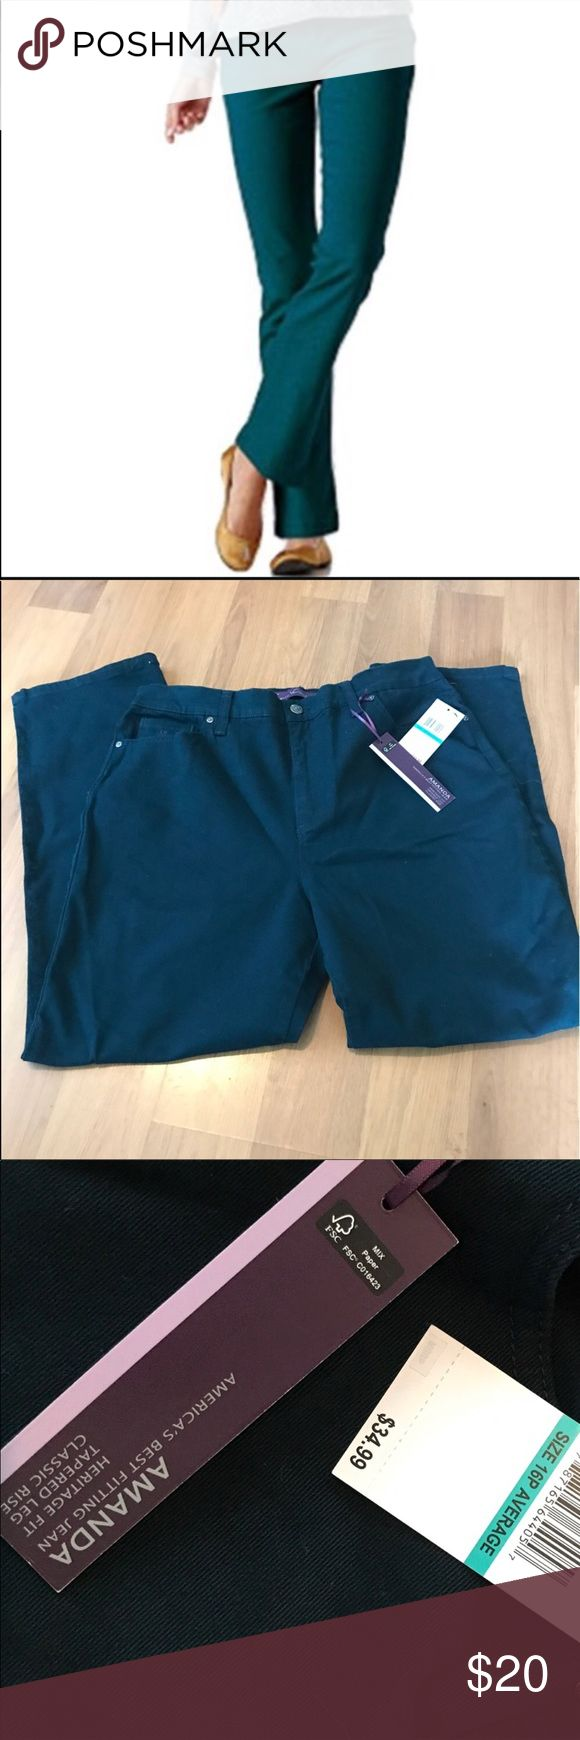 Gloria Vanderbilt Amanda jeans NWT. Size 16P. Amalfi coast (dark green). Heritage fit, tapered leg, classic rise. Gloria Vanderbilt Jeans